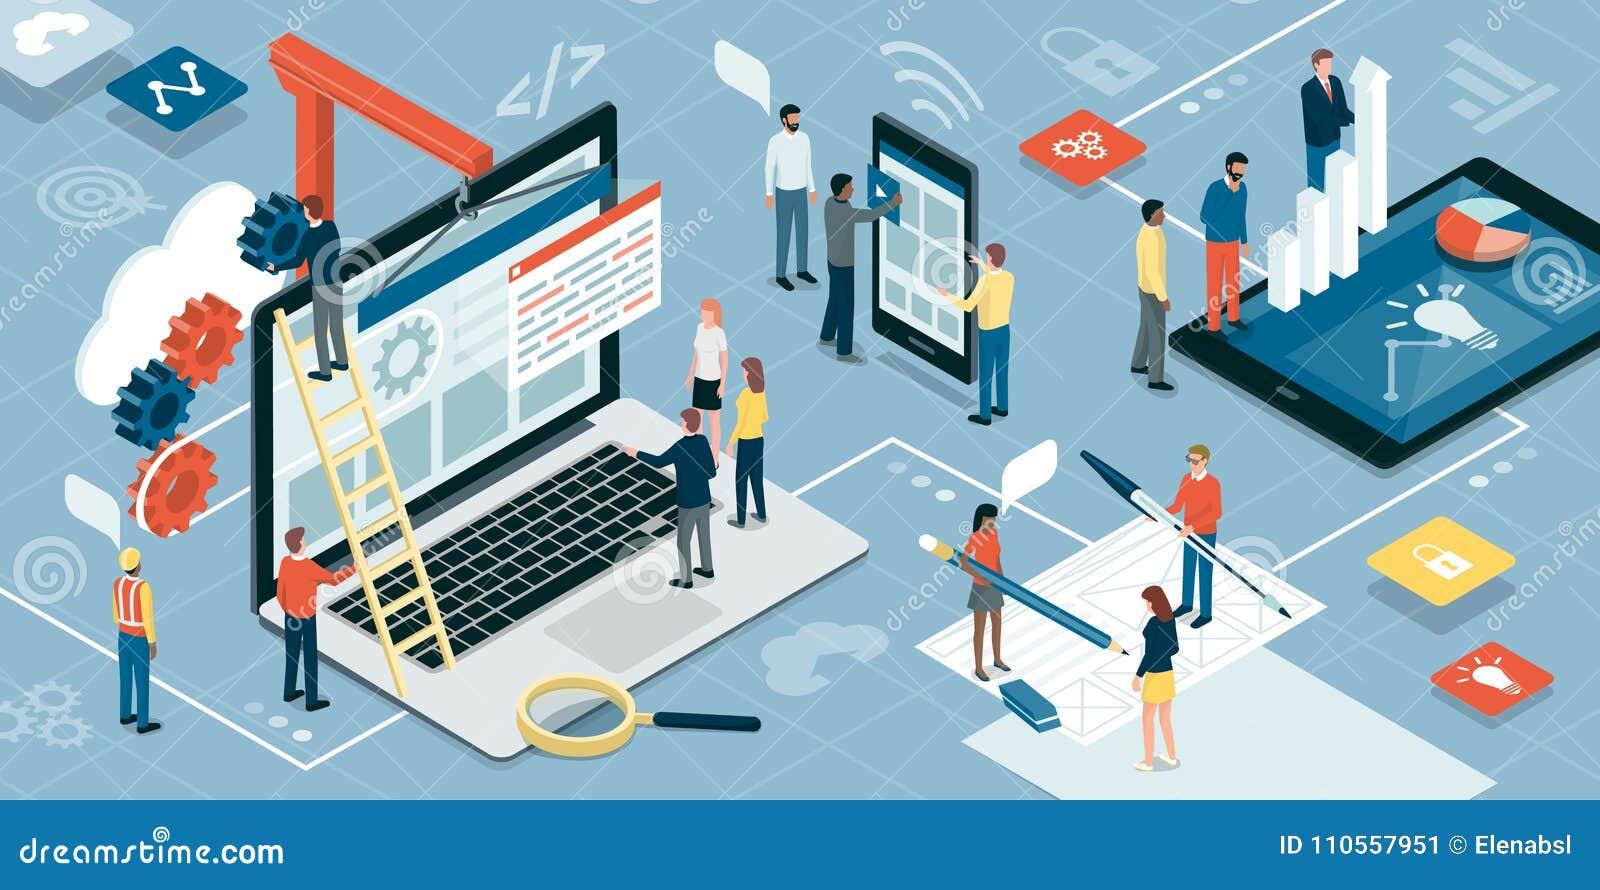 Web Development Graphic Design And Marketing Stock Vector Illustration Of Design Agency 110557951